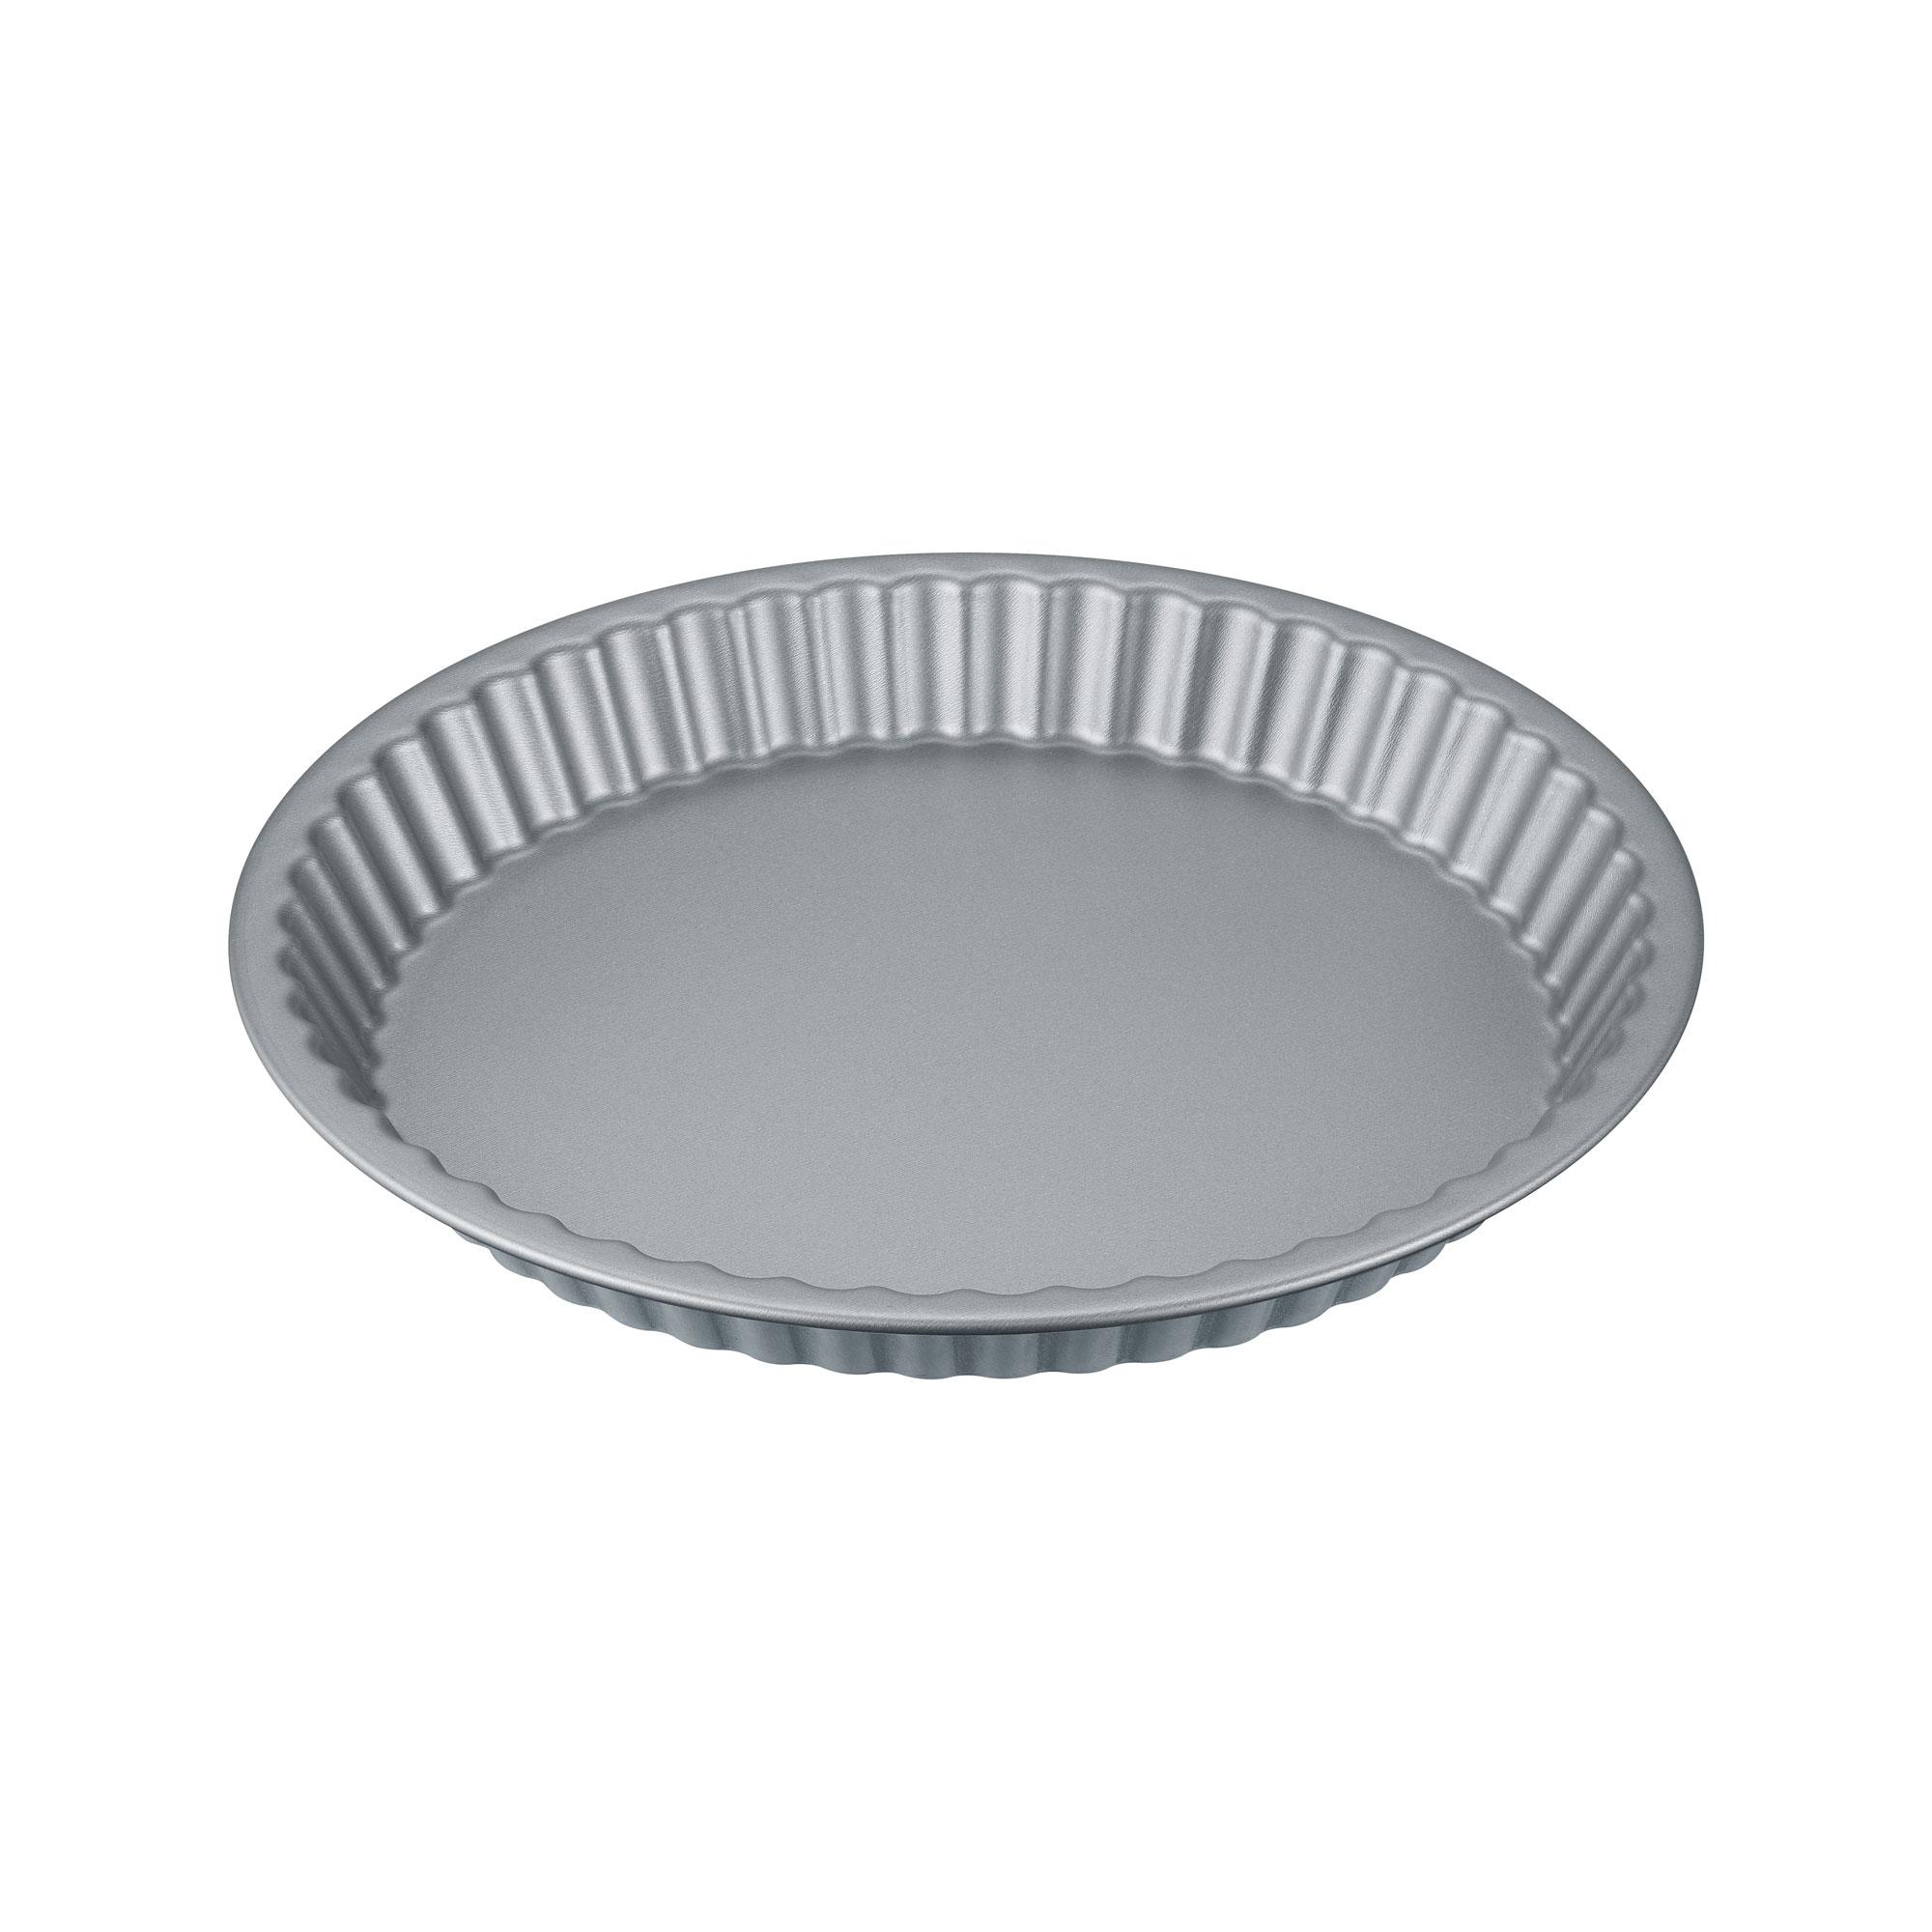 Quiche and tarte pan 30 cm